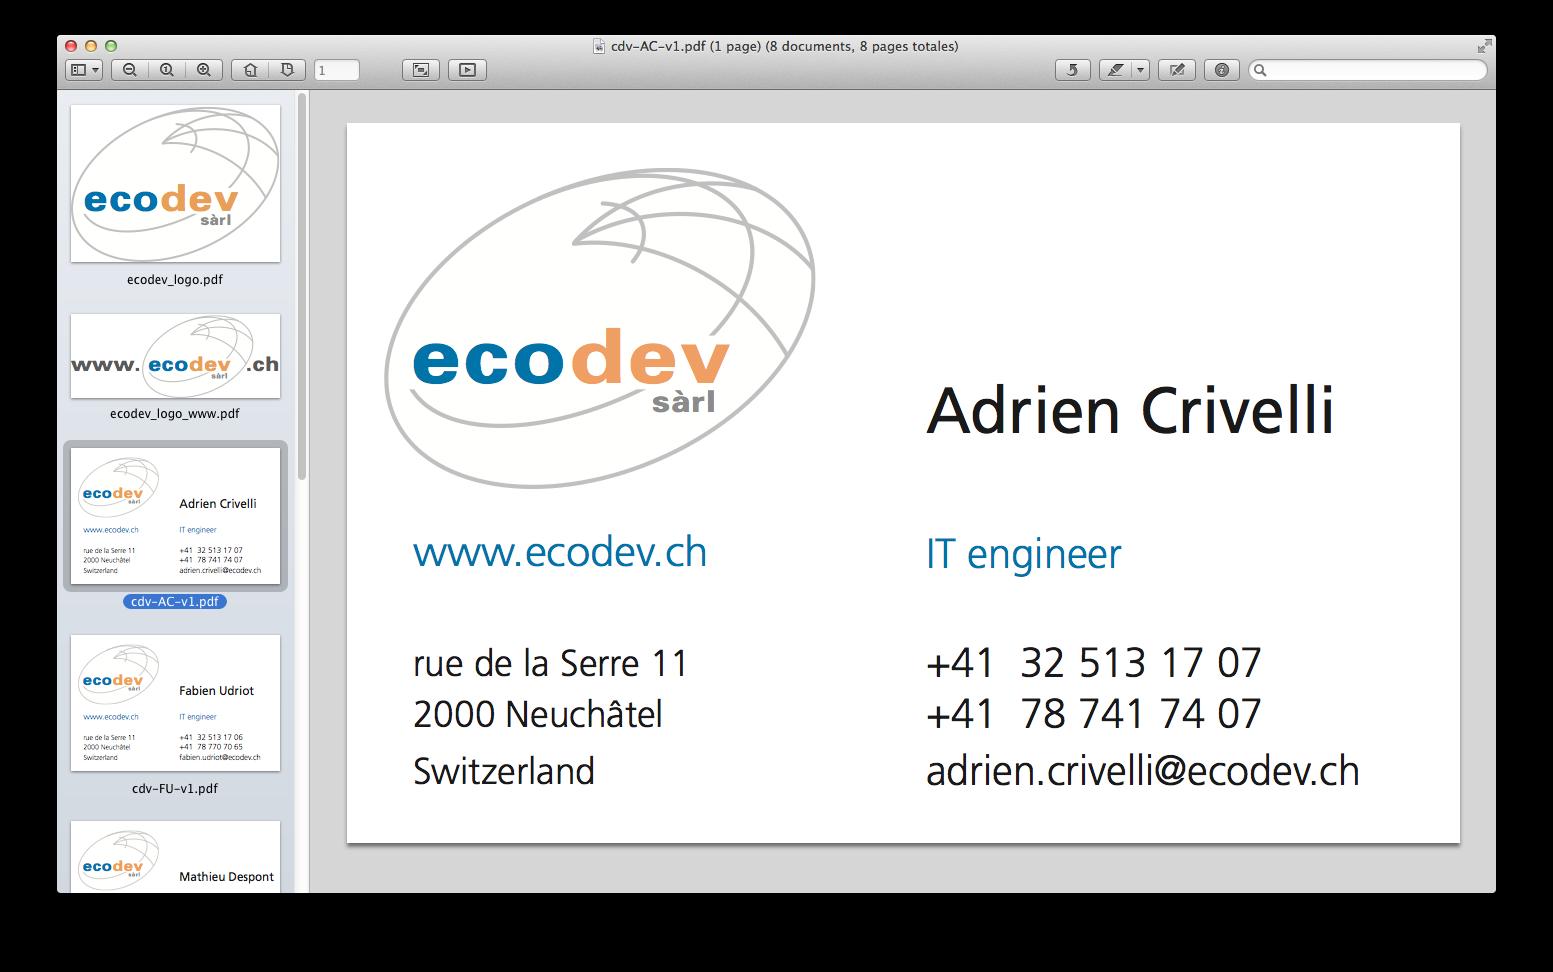 Ecodev - carte de visites